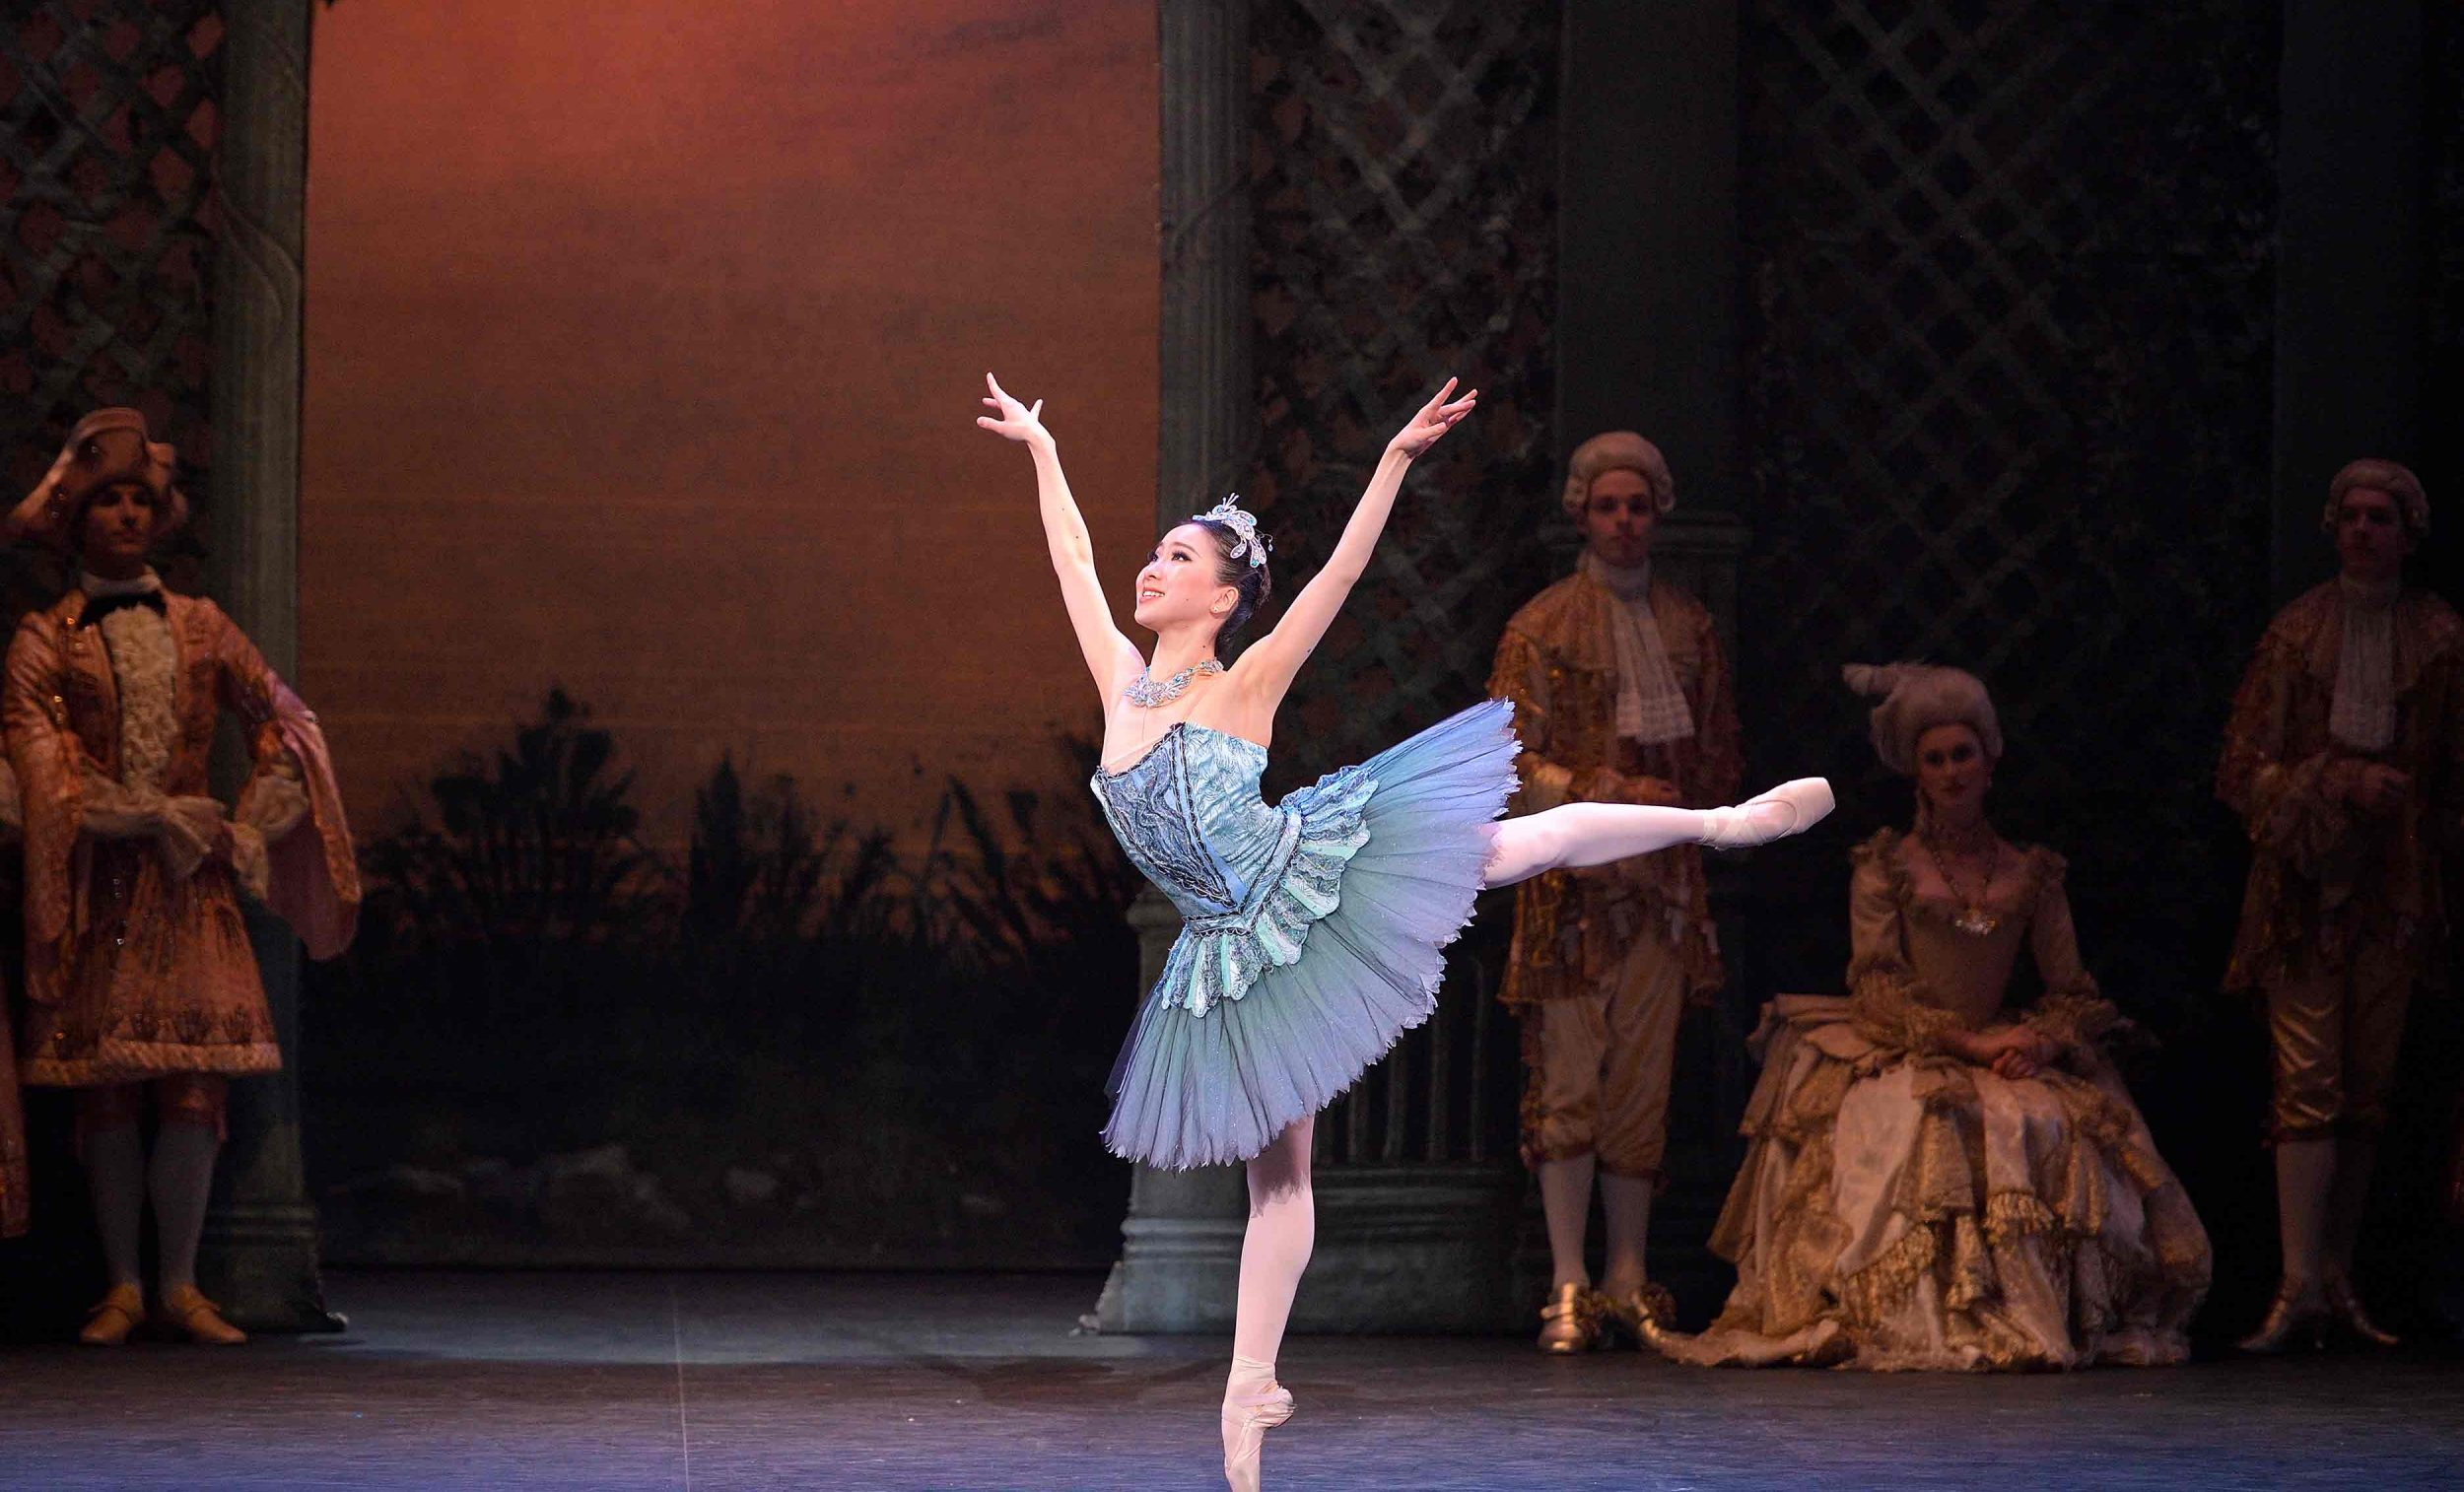 Rina-Kanehara-as-Princess-Florine-in-The-Sleeping-Beauty-©-Laurent-Liotardo-(2)_WEB